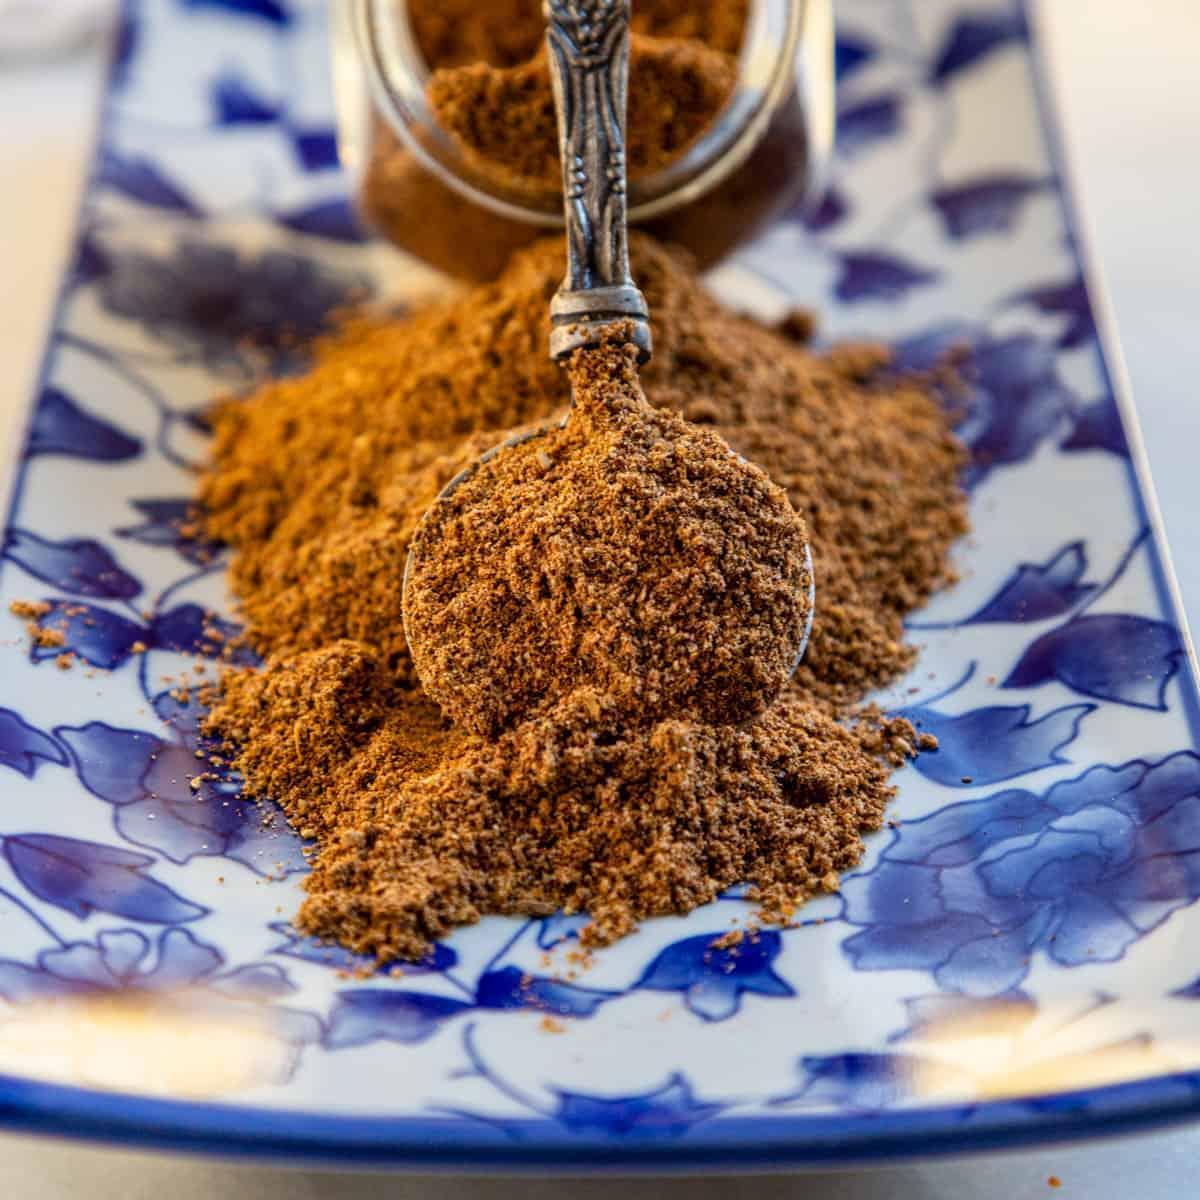 close up image: ground szechuan seasoning on spoon